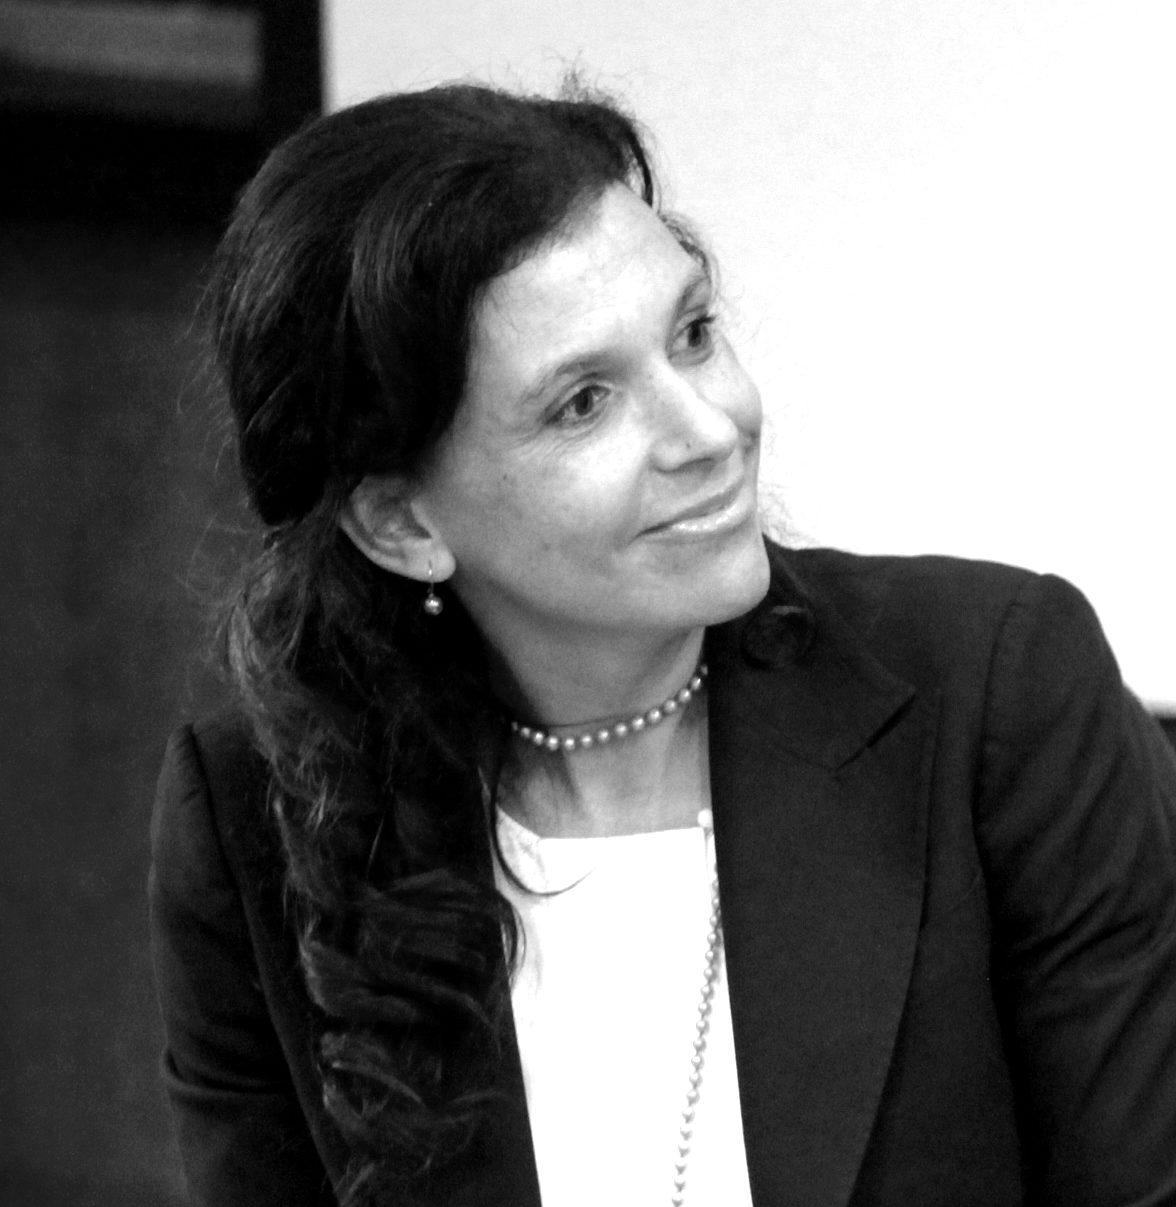 Ana Margarida Ximenes